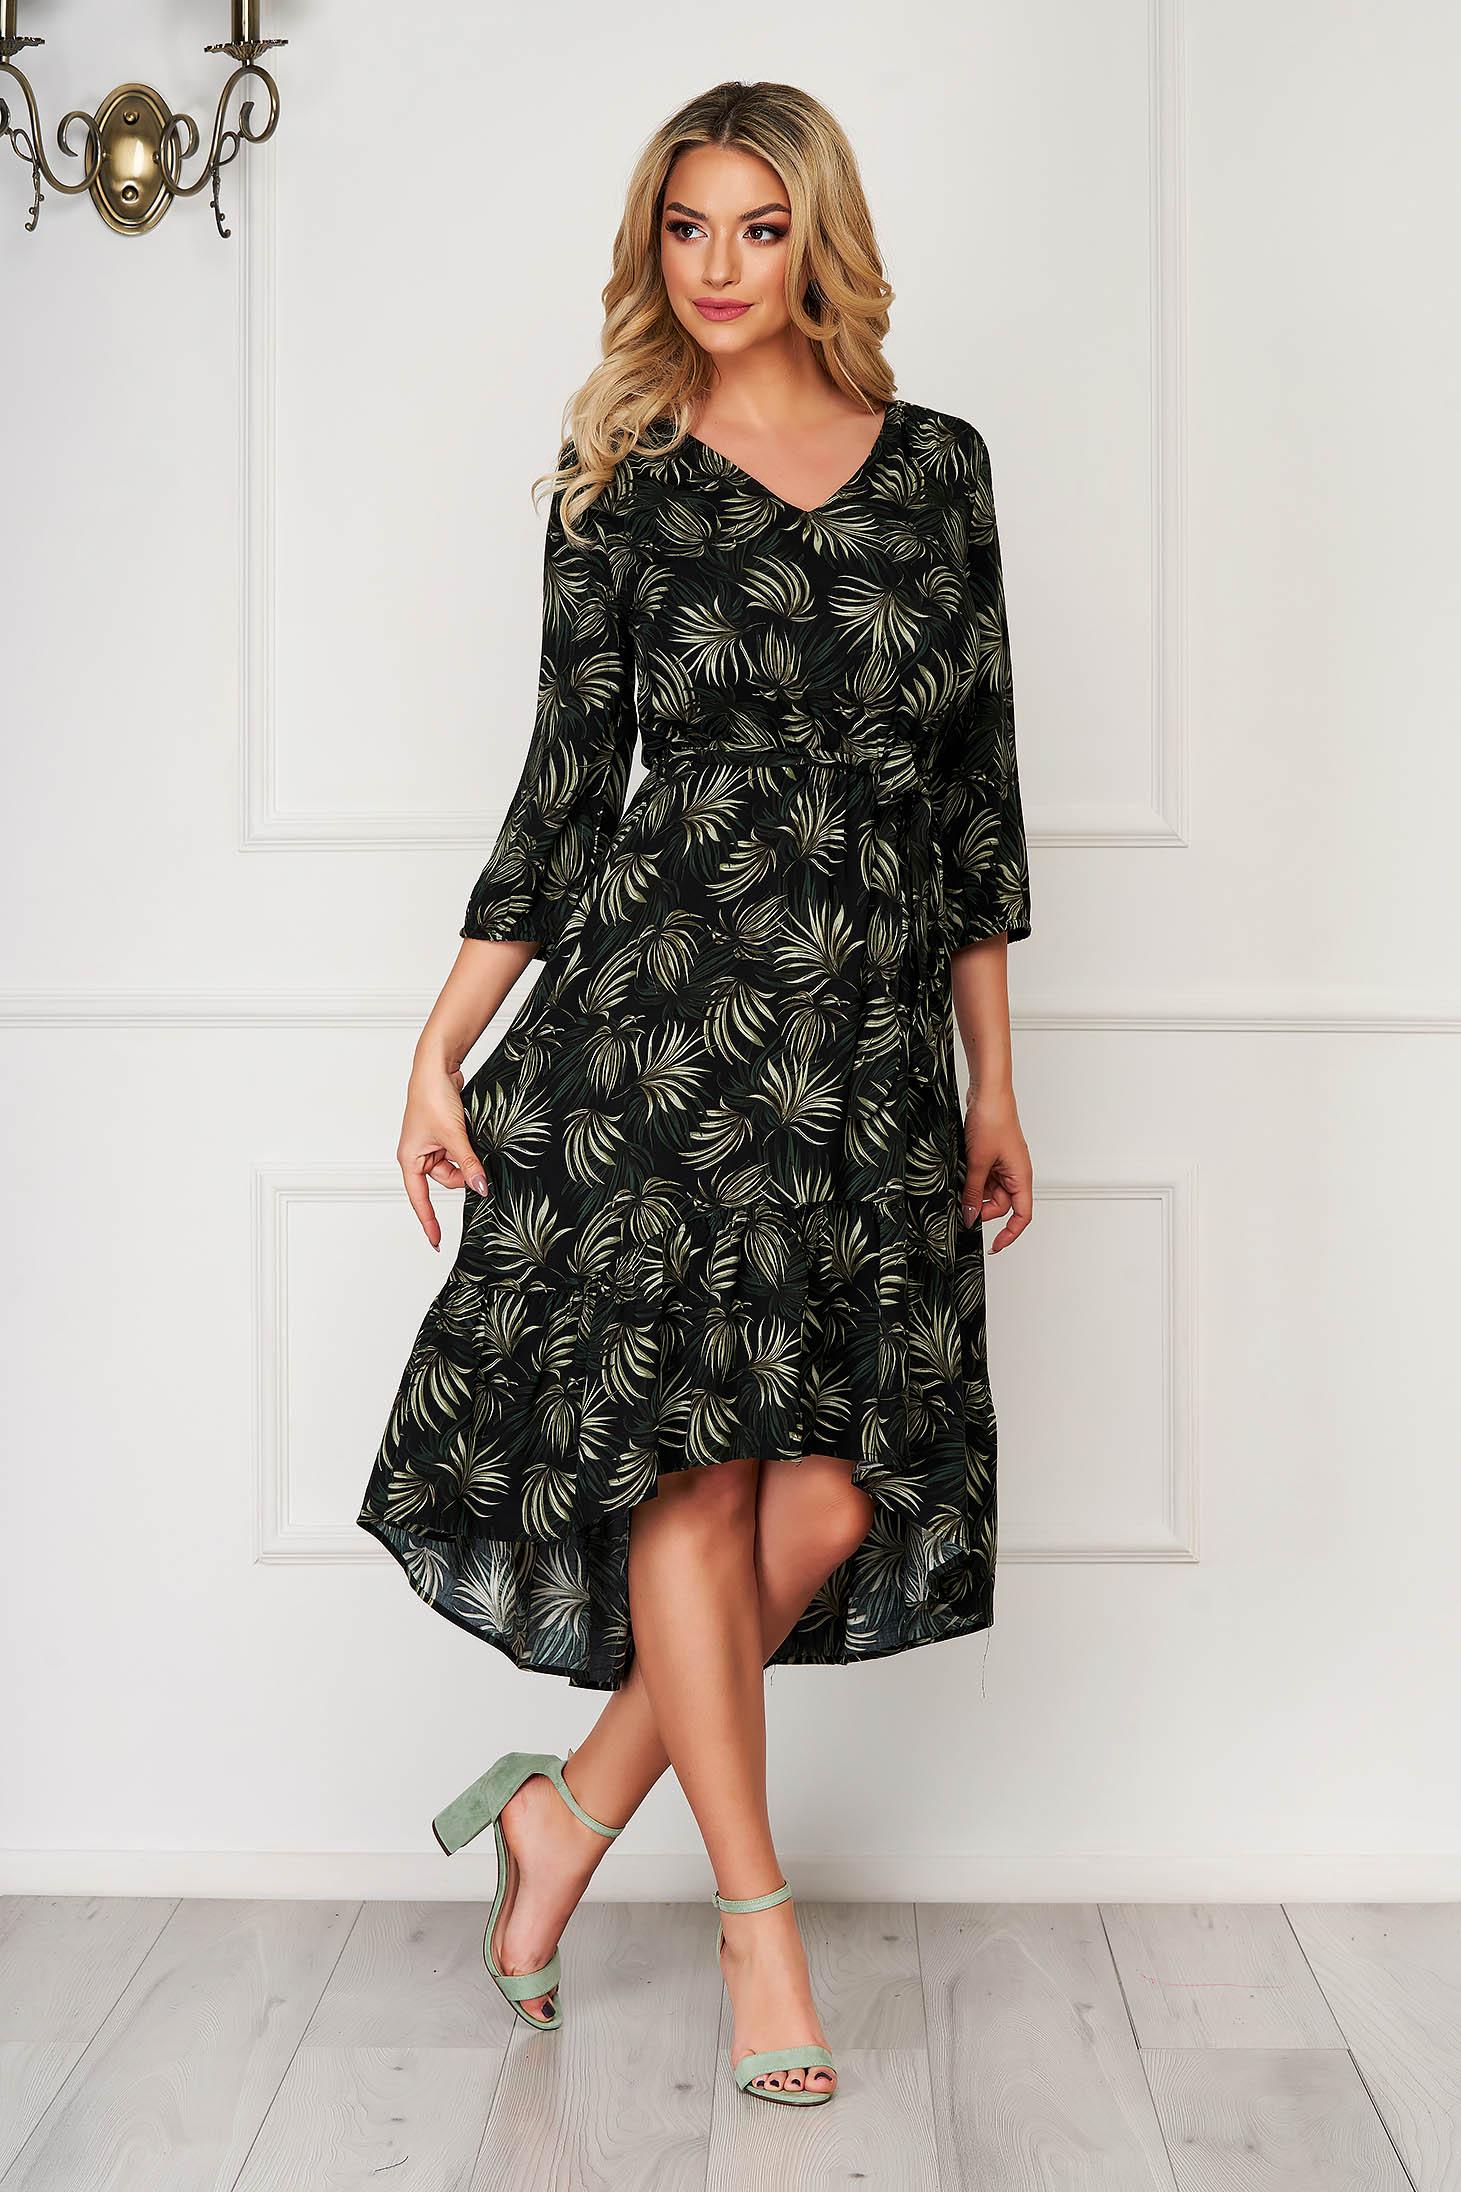 Black dress midi daily asymmetrical cloche airy fabric